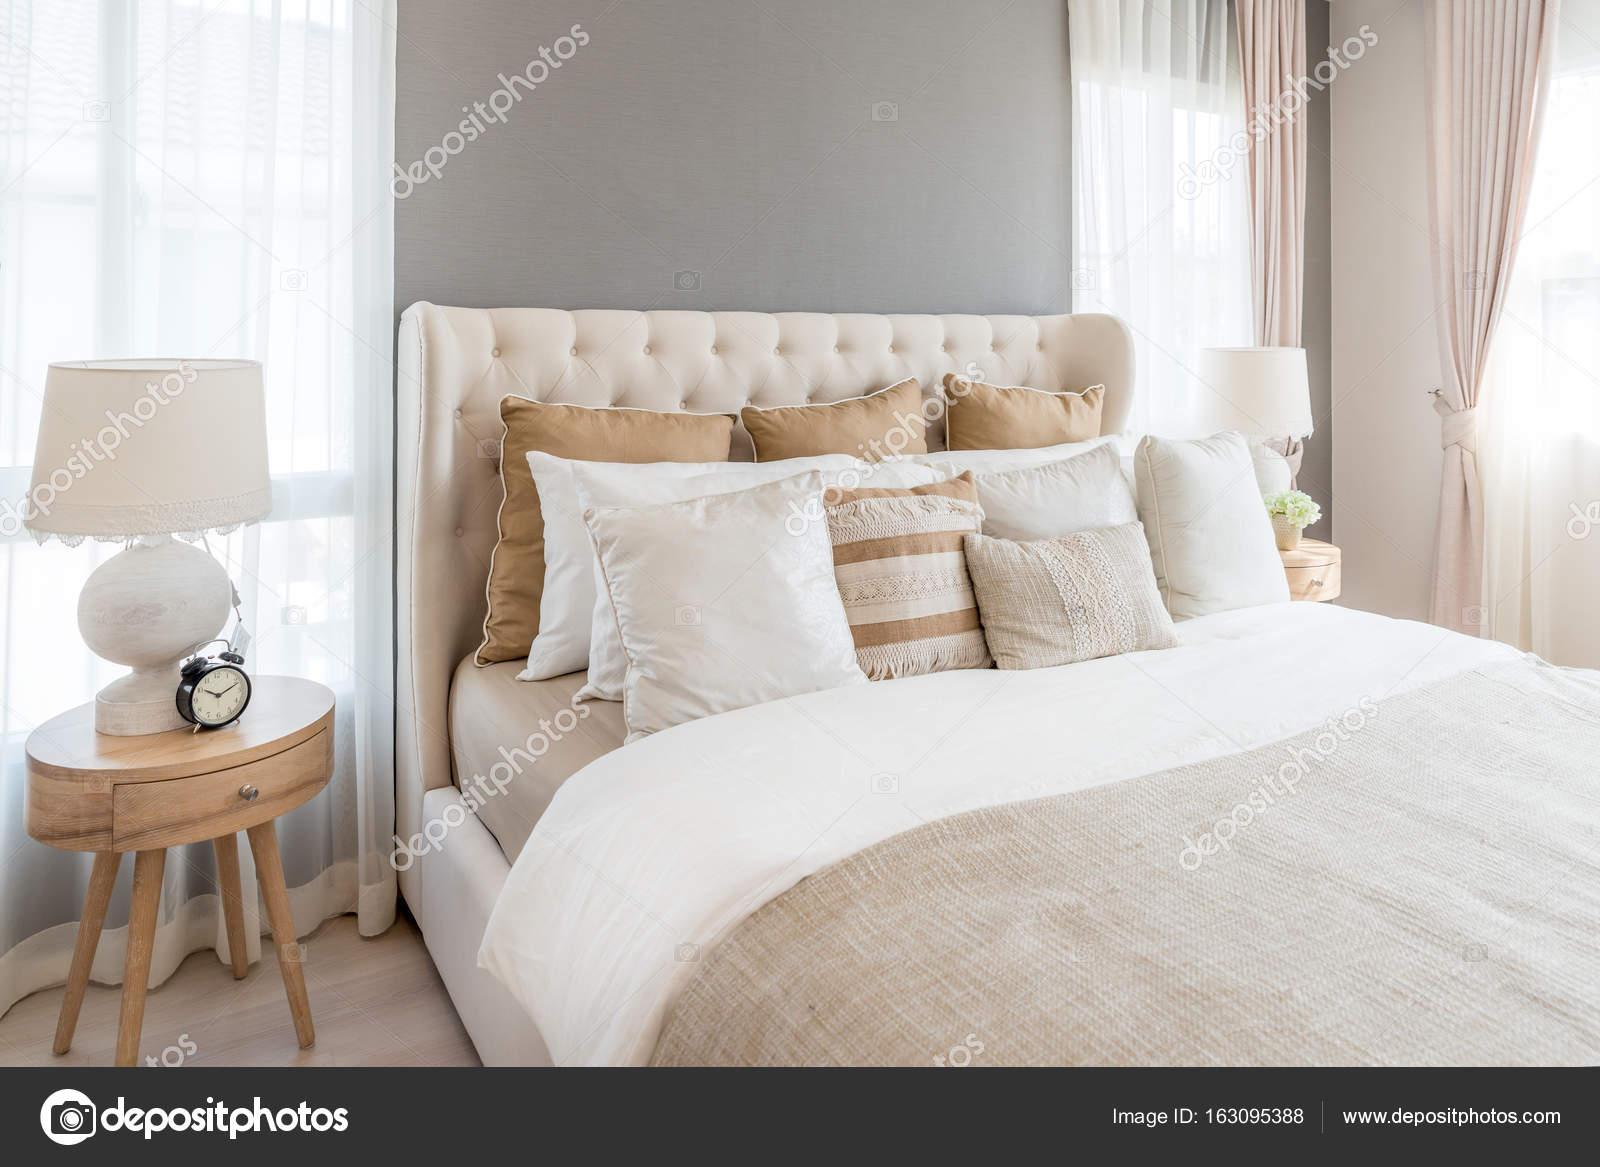 https://st3.depositphotos.com/3049830/16309/i/1600/depositphotos_163095388-stock-photo-bedroom-in-soft-light-colors.jpg